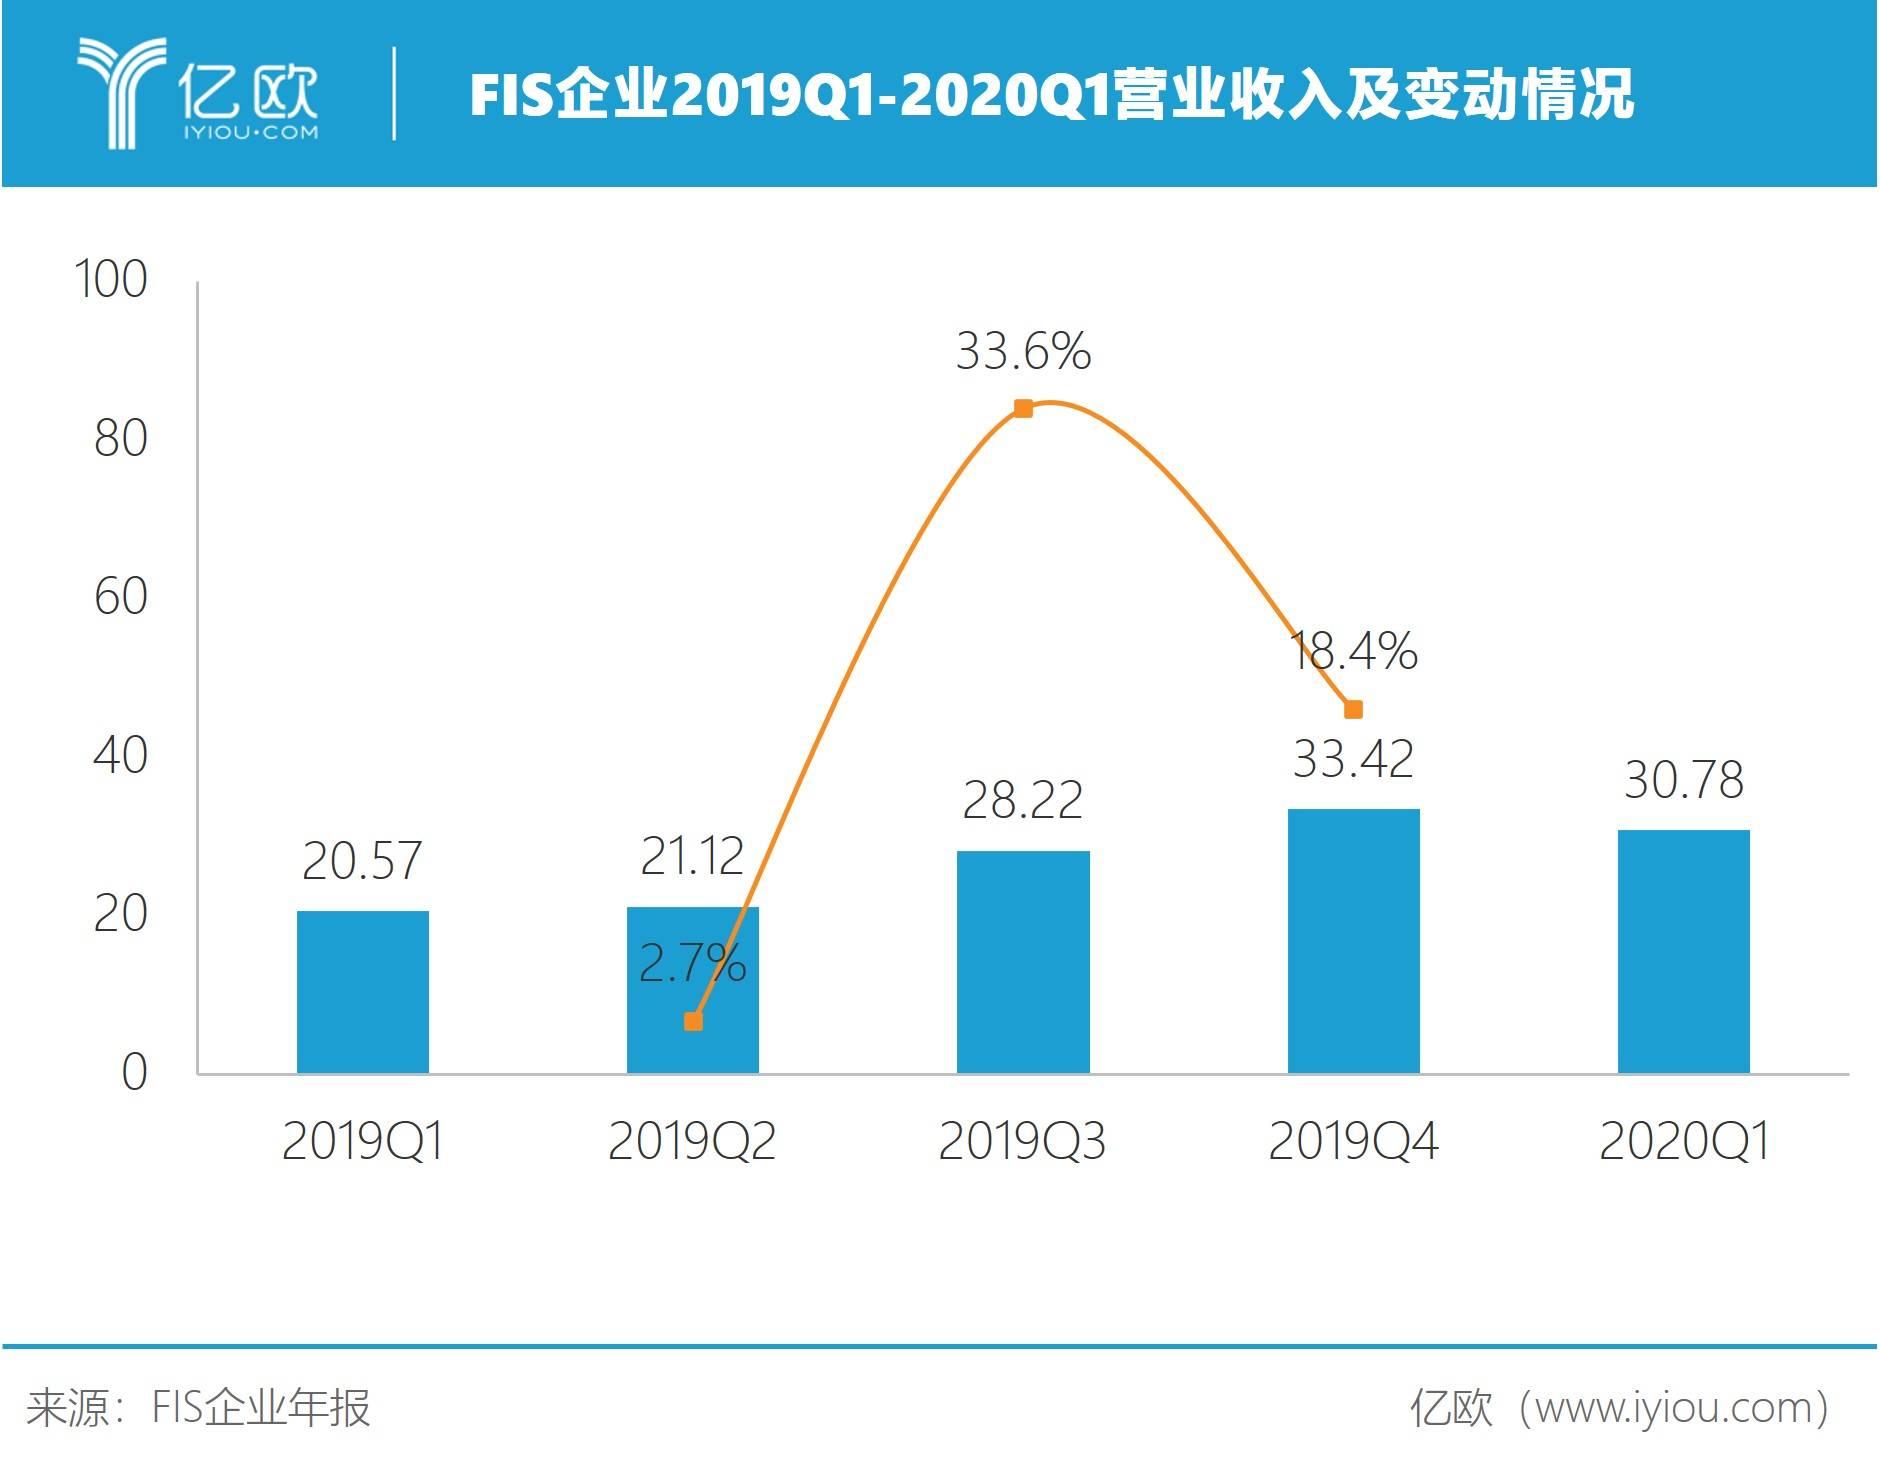 FIS企业2019Q1-2020Q1营业收入及变动情况